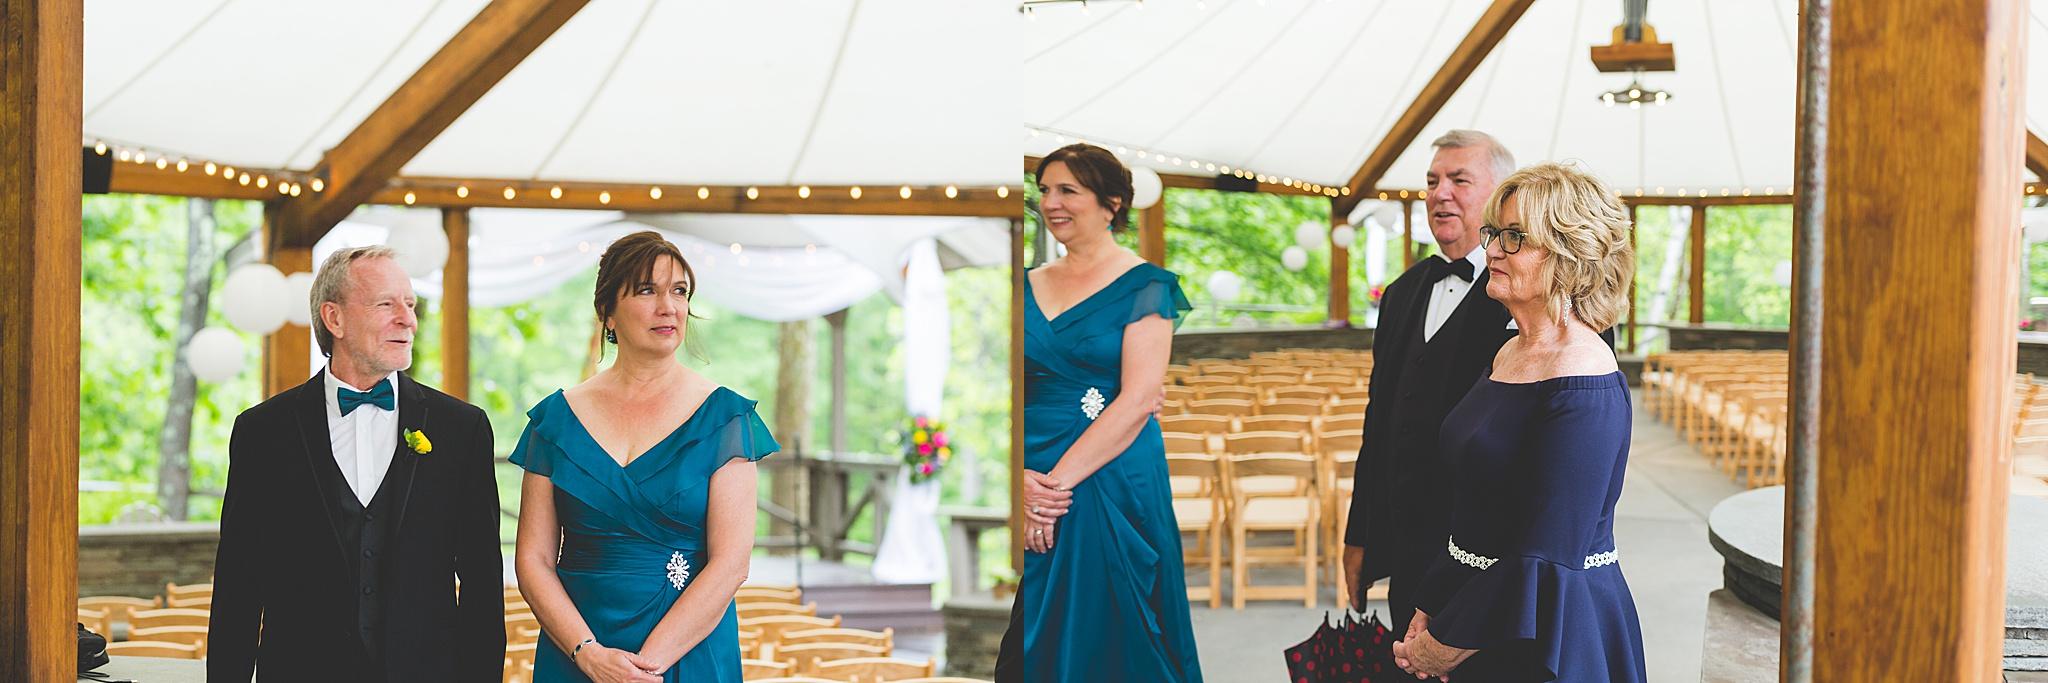 Albany_Wedding_Photographer_7349.jpg